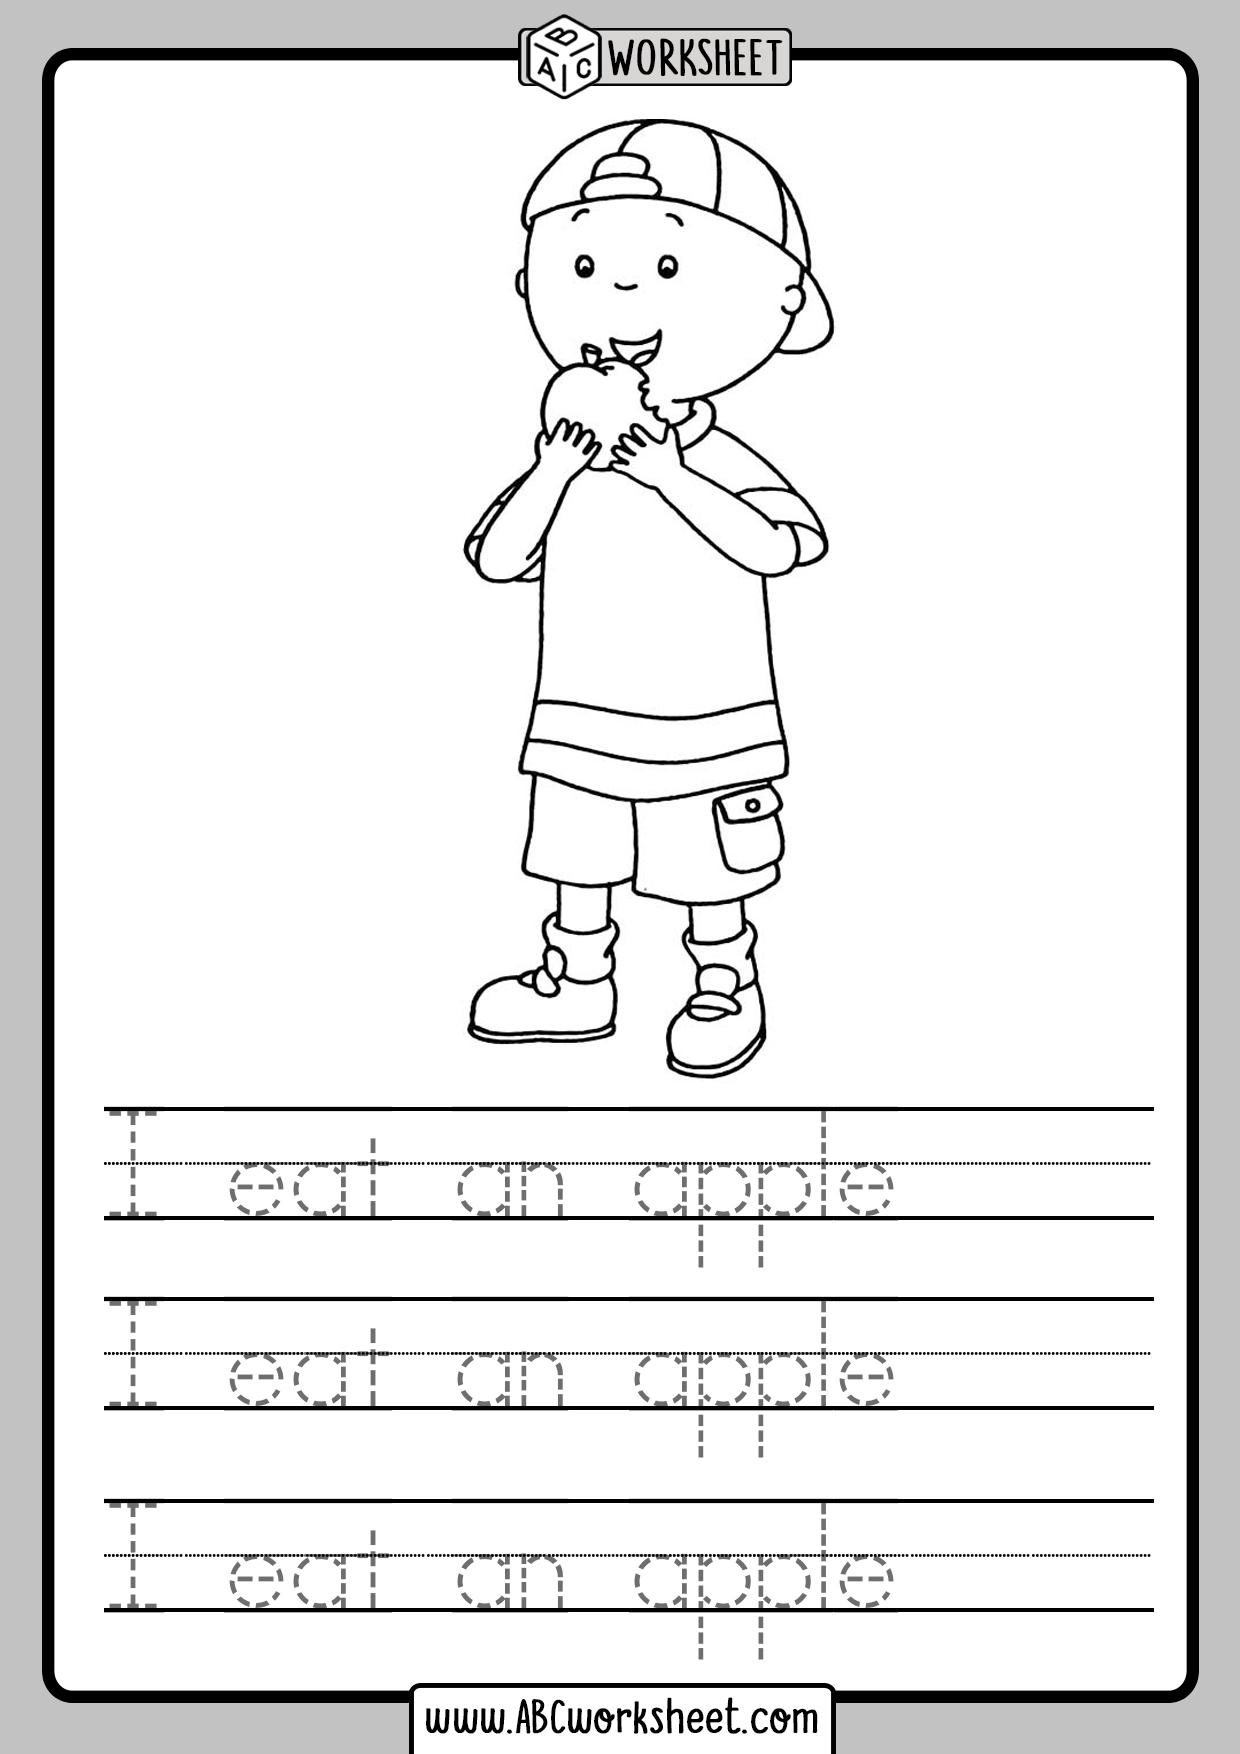 Handwriting Worksheets For Kids